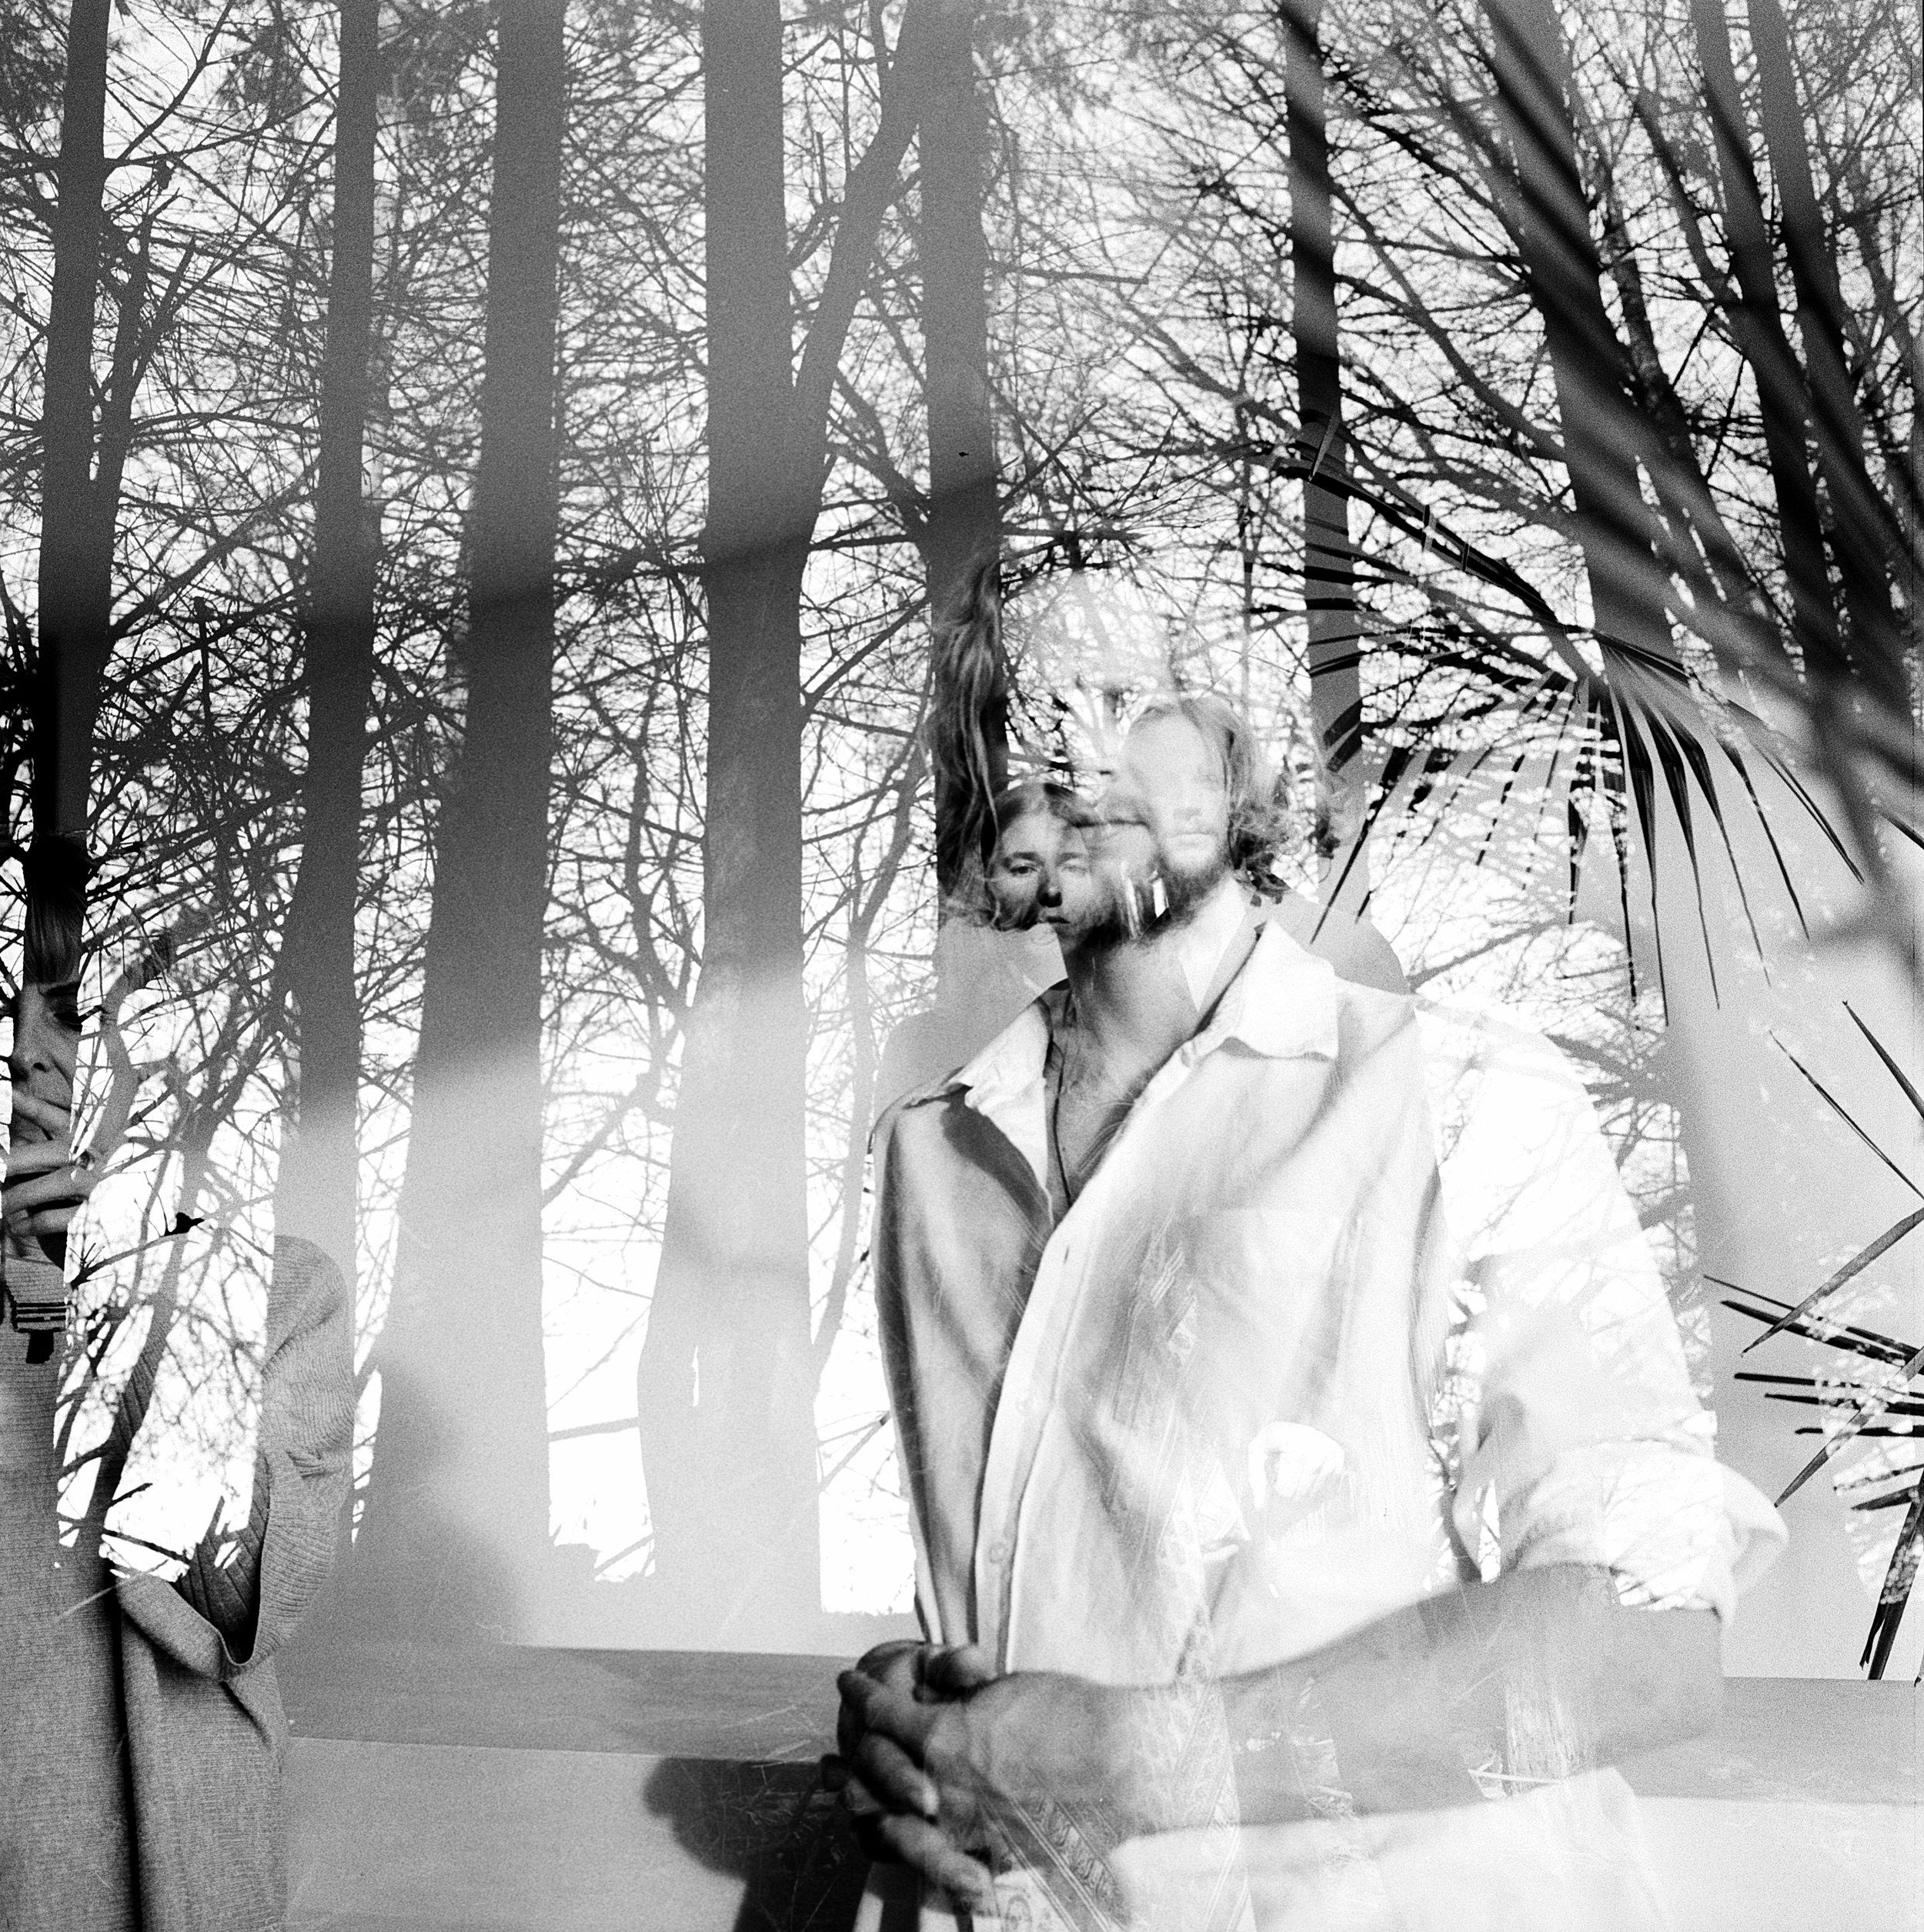 Samana, Samana Music, Samana Photography, Double Exposed Film, Rebecca Rose Harris, Black and white